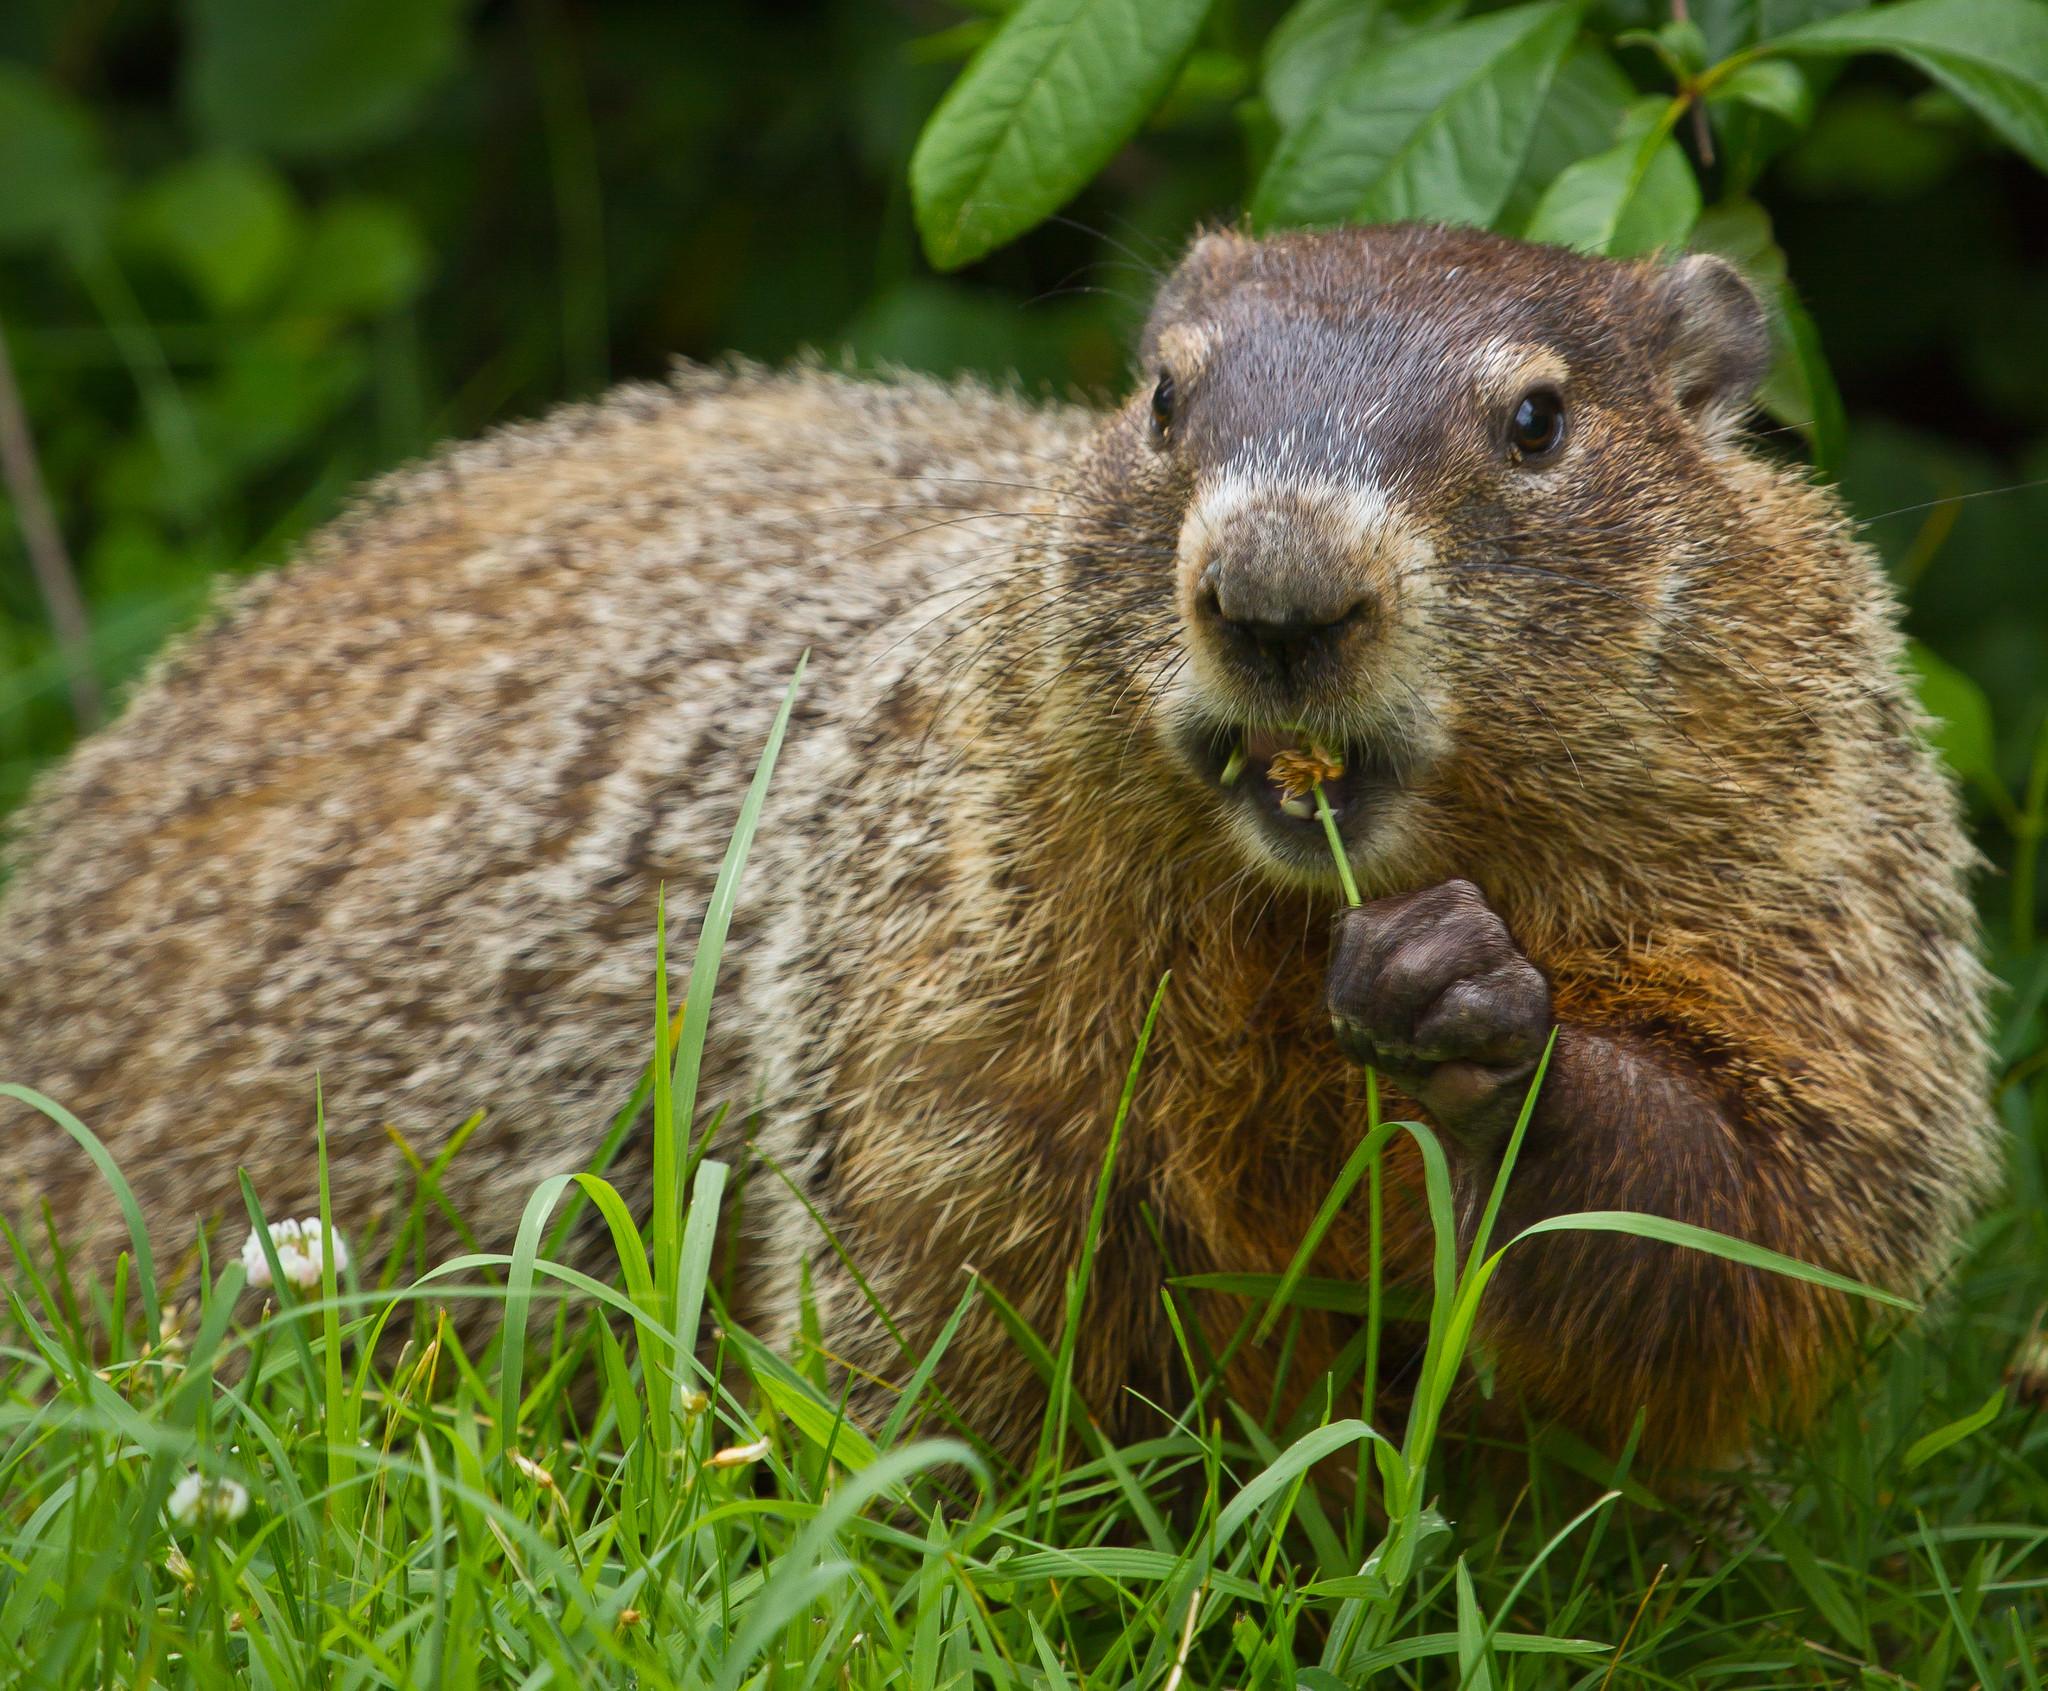 Modern-day ground hog, photographed in Shenandoah National Park (Evolution of Mammals)